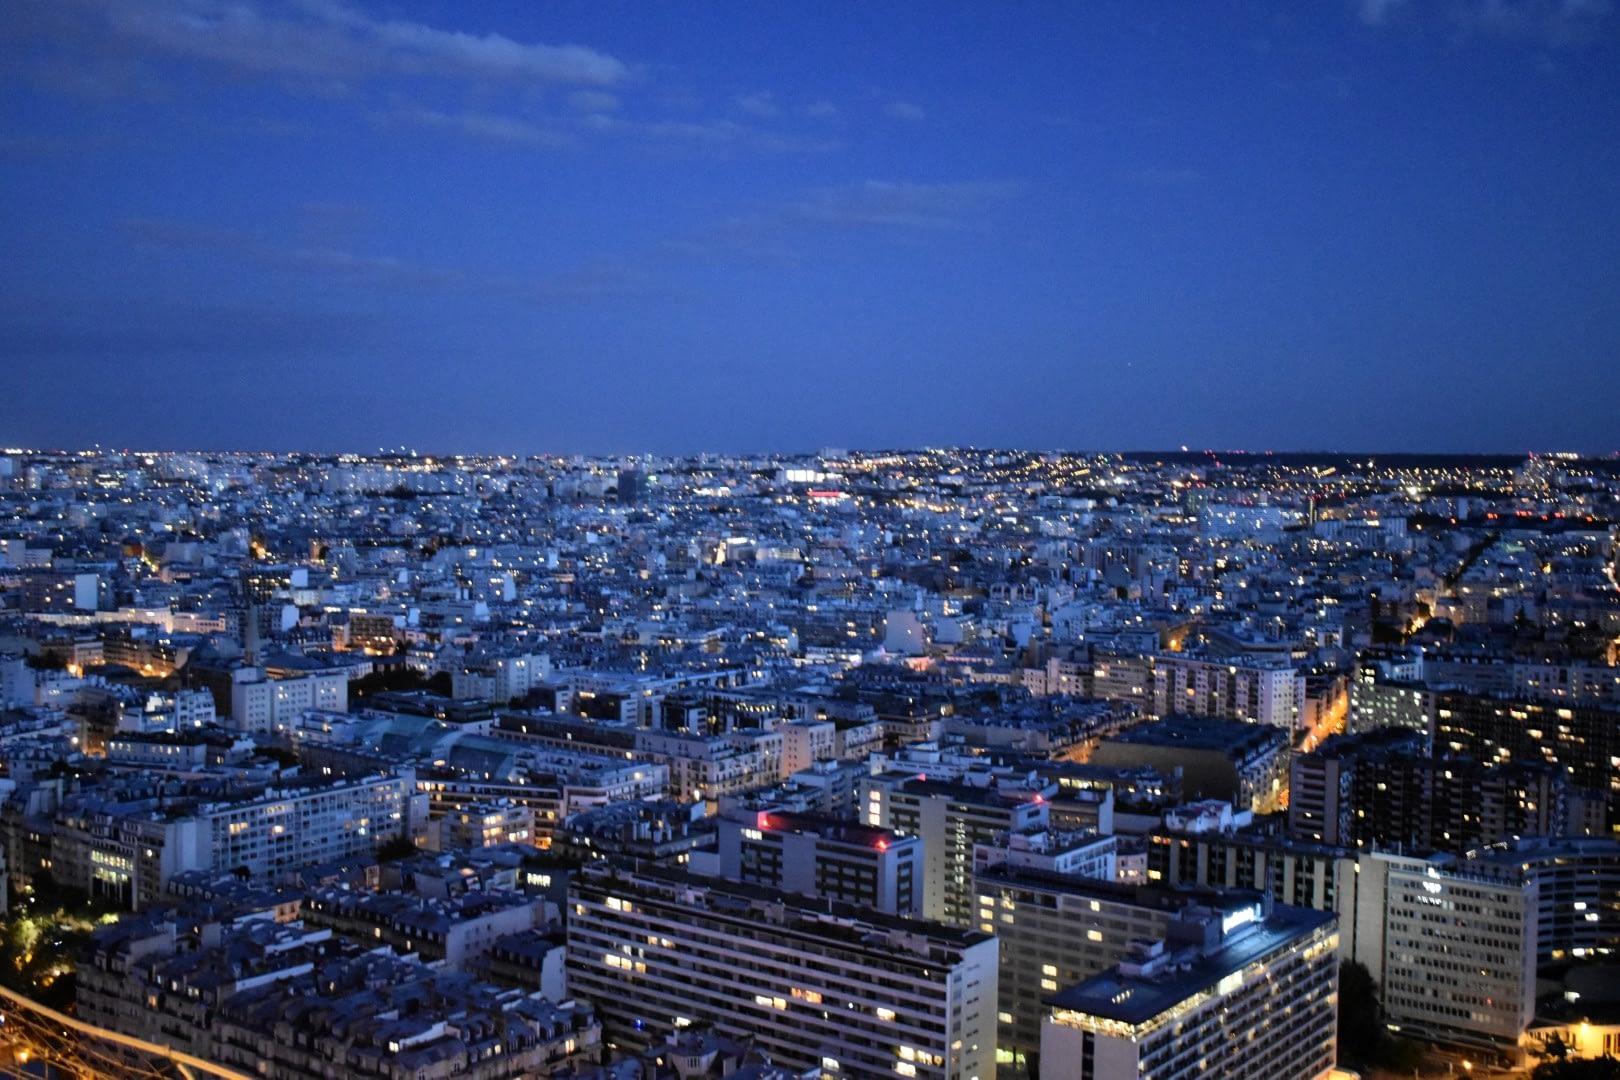 Second floor of the Eiffel Tower, Paris